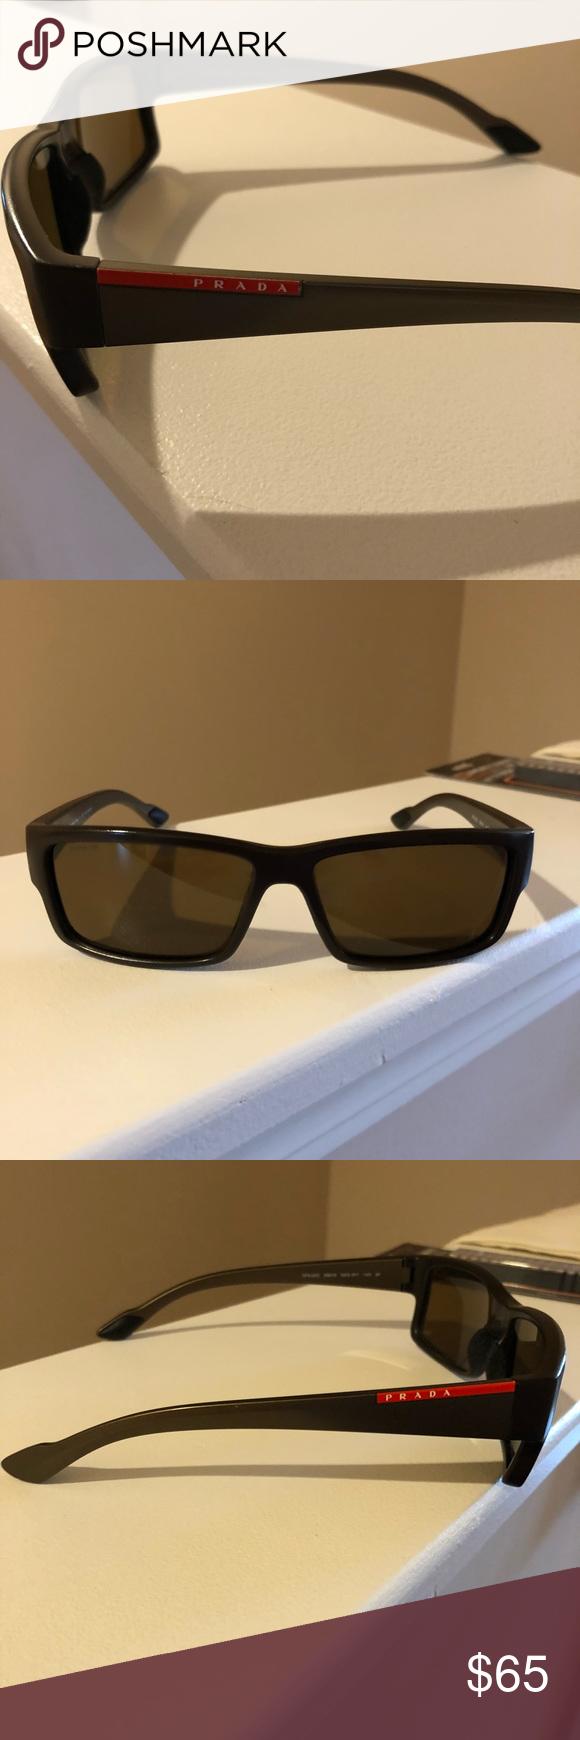 7ac82d4d975d Genuine Men s Prada sunglasses Genuine men s Prada sunglasses - lenses are  in good shape